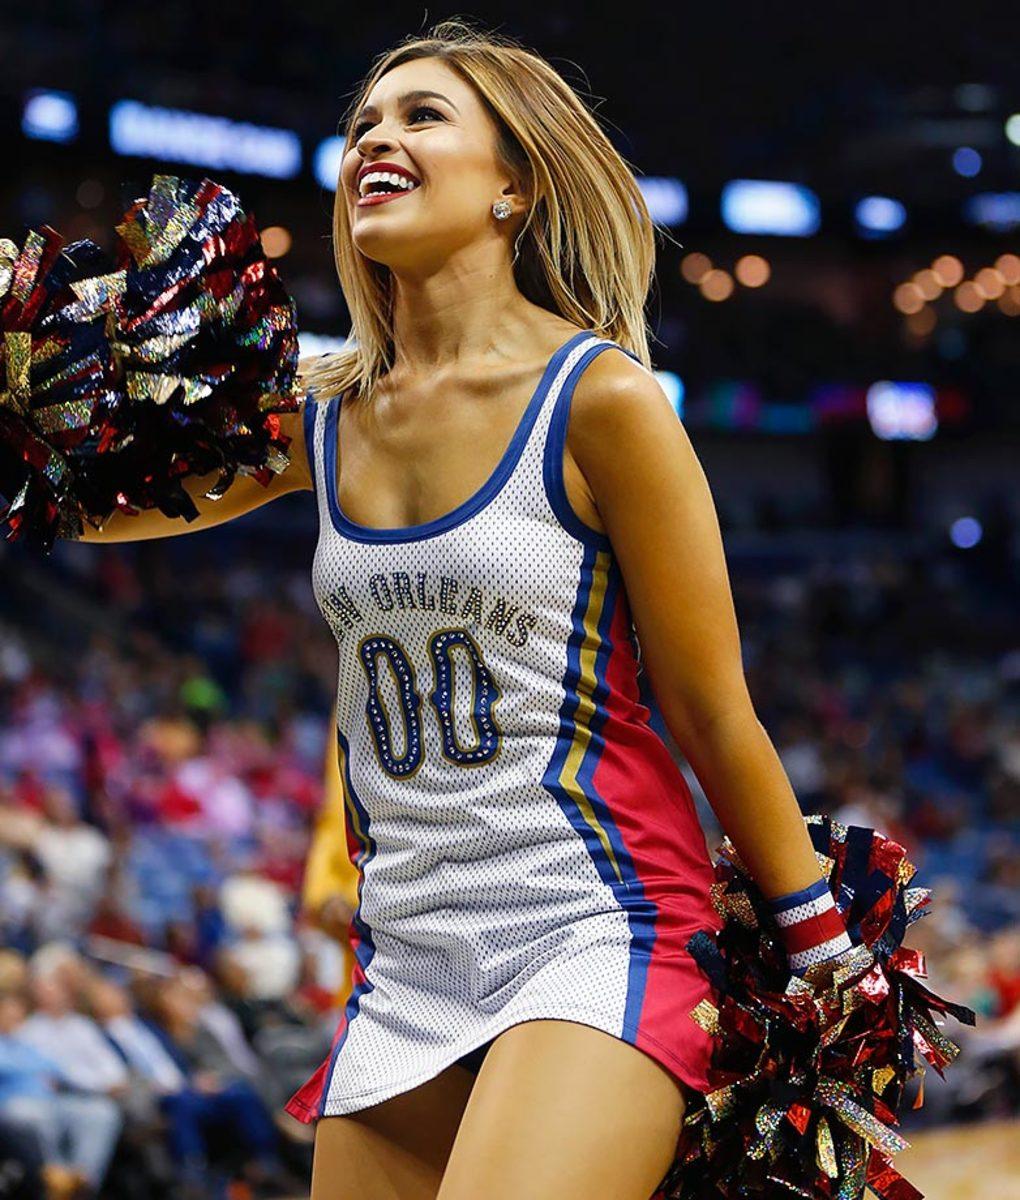 New-Orleans-Pelicans-Dancers-d4d7af9ddcae48e1a48125215270359a-0.jpg